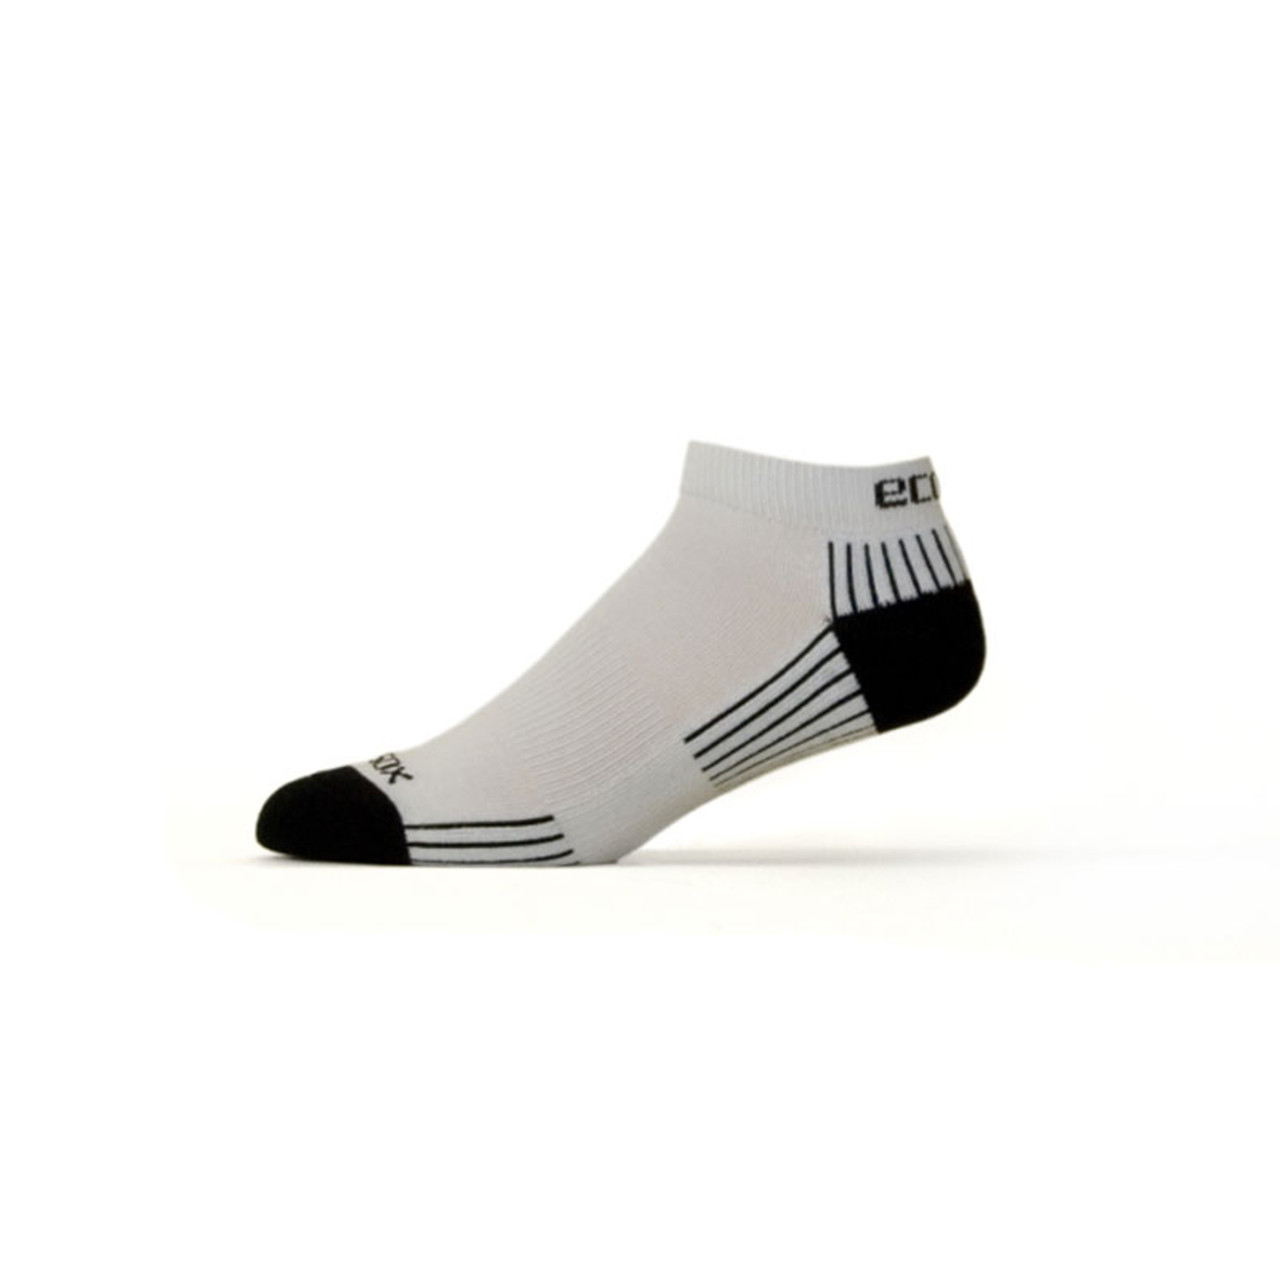 Active Sport Lo Cut Medium White with Black